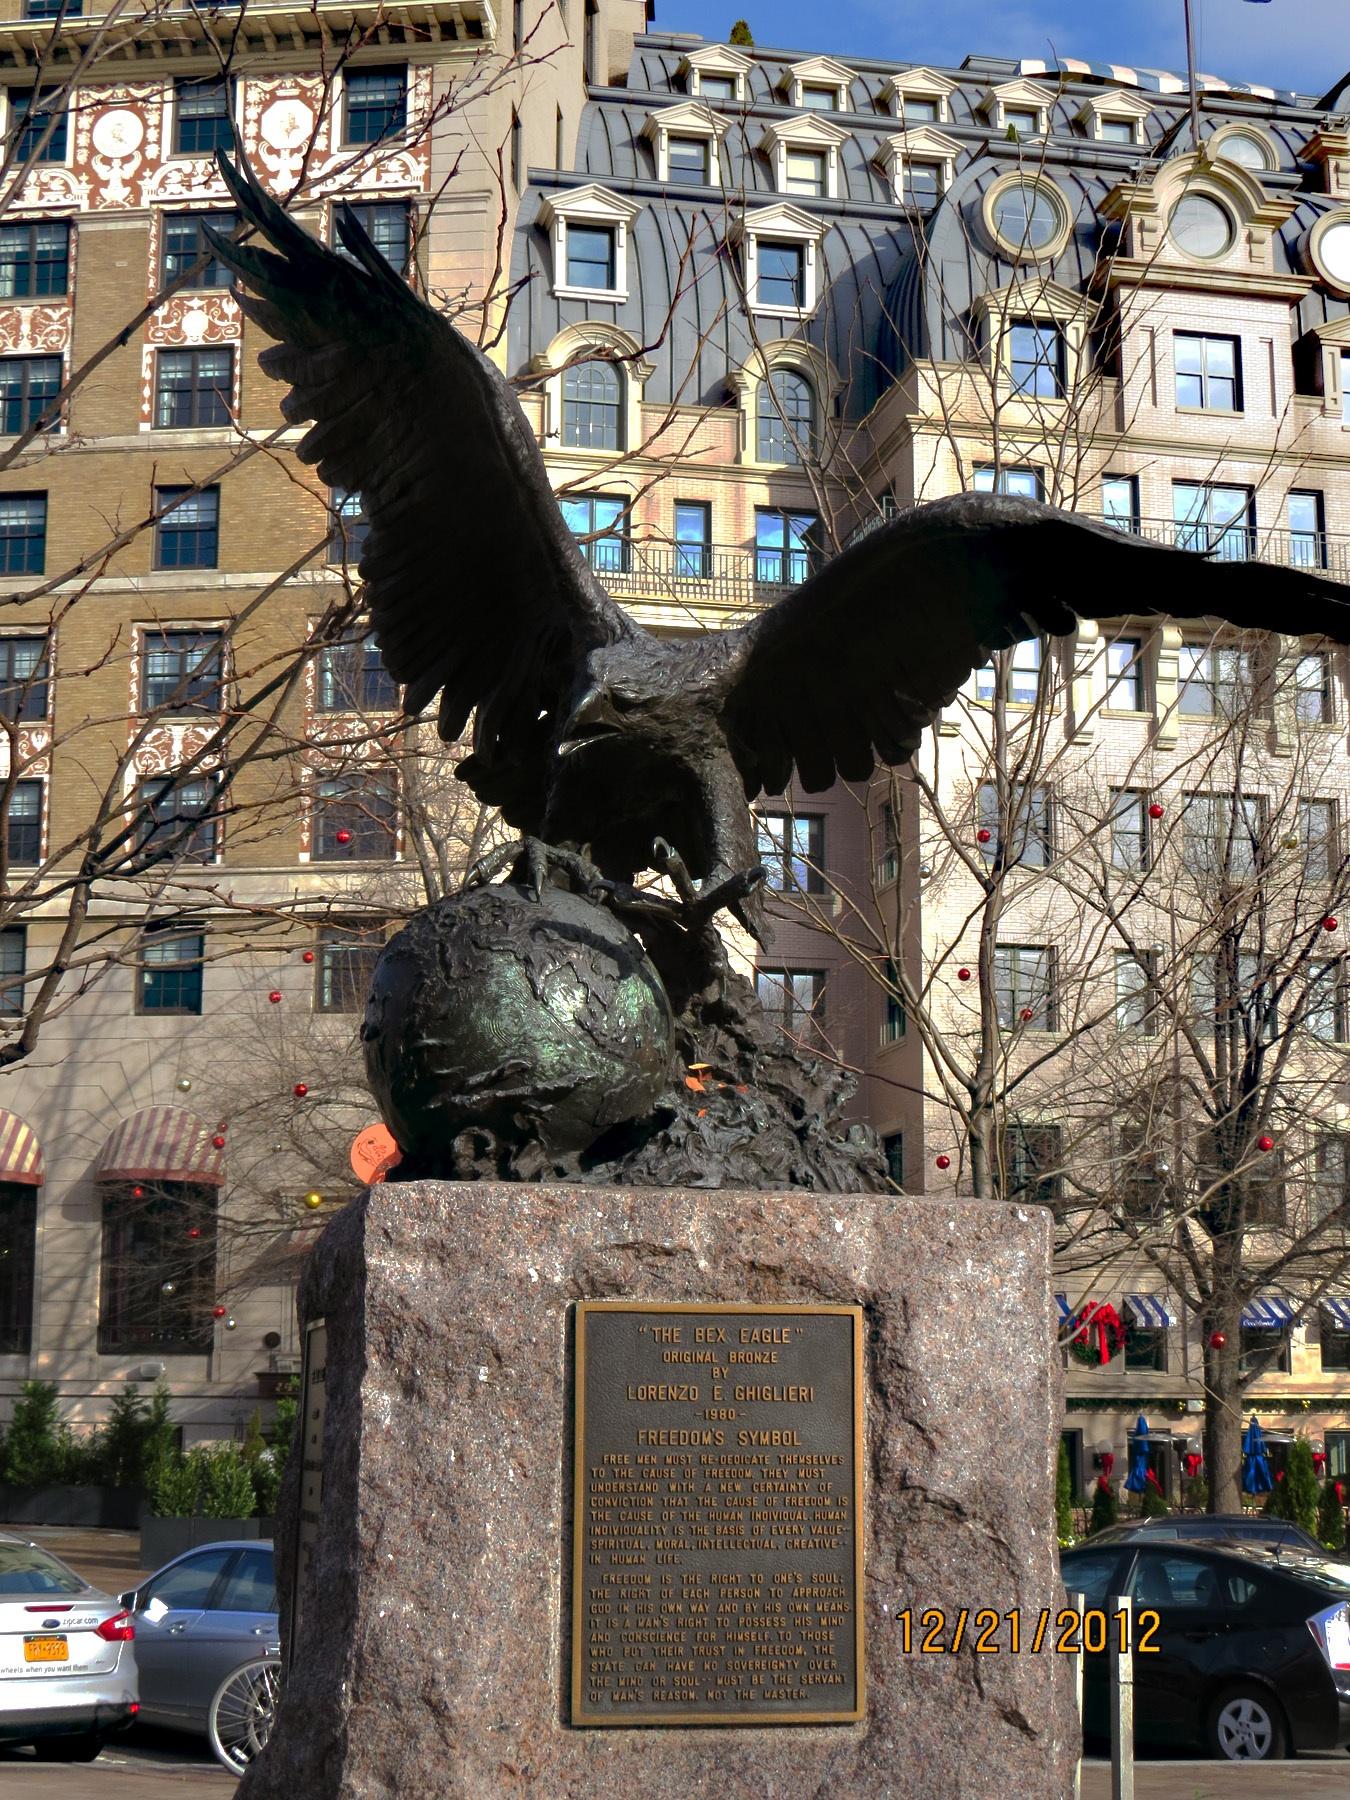 Bex Eagle